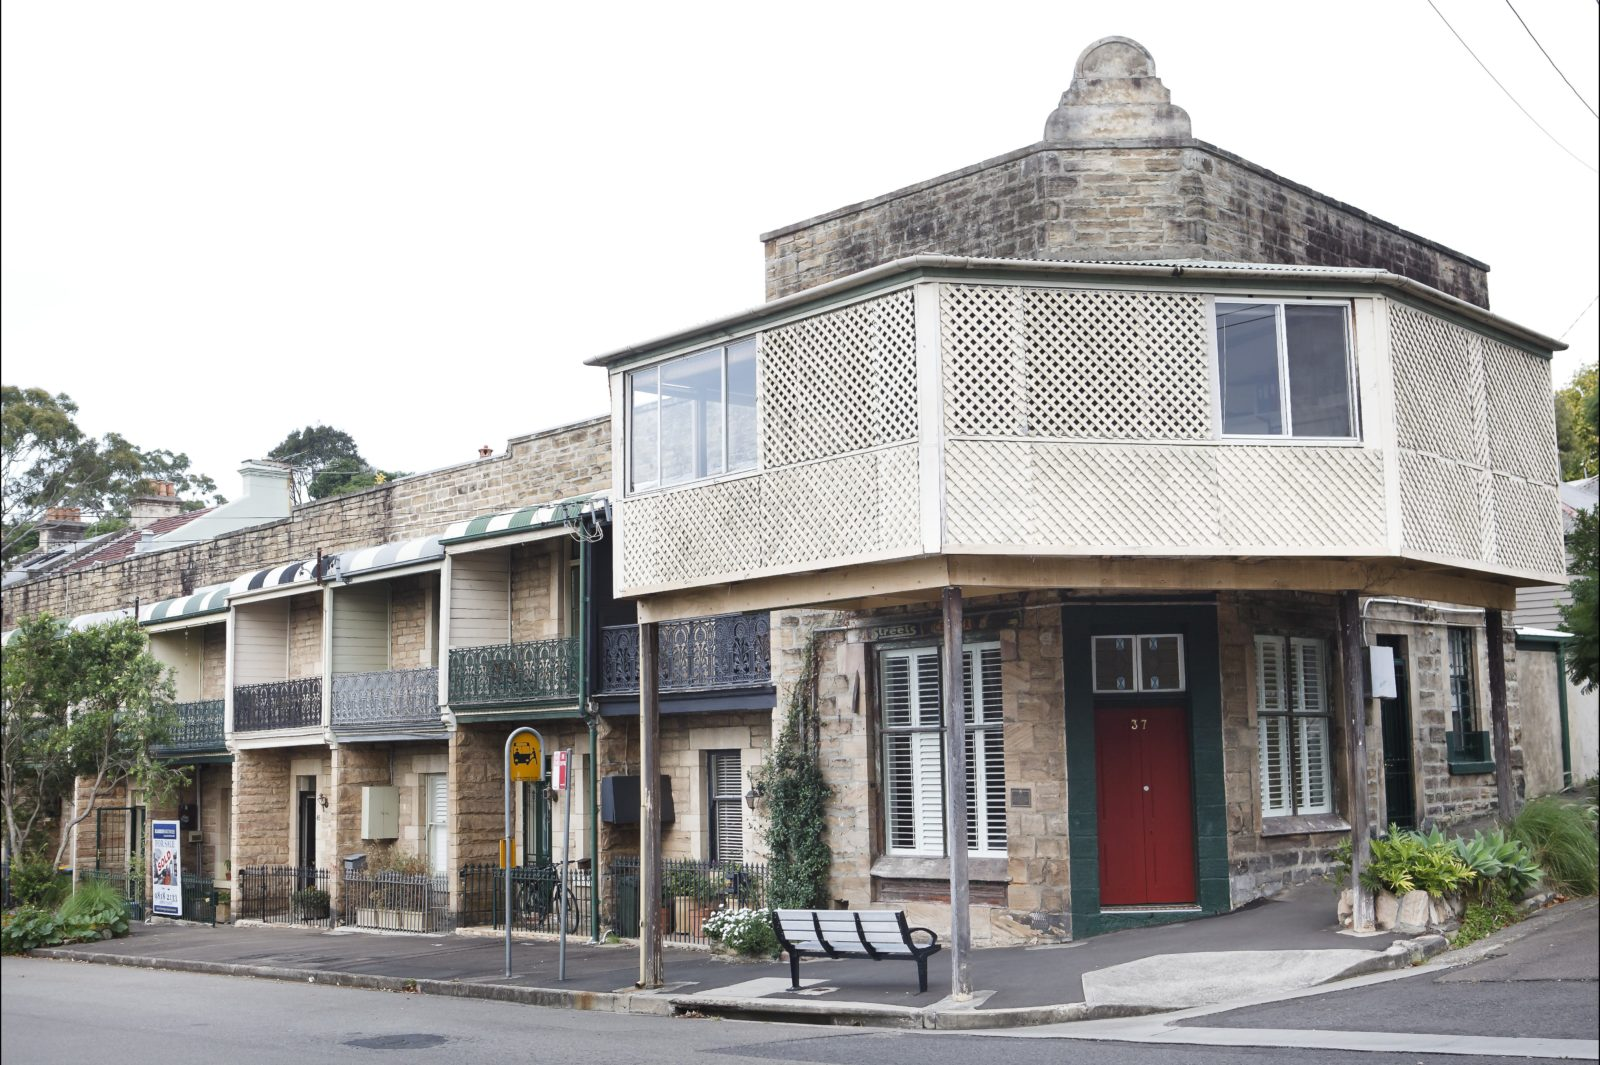 Darling St Balmain, Sydney